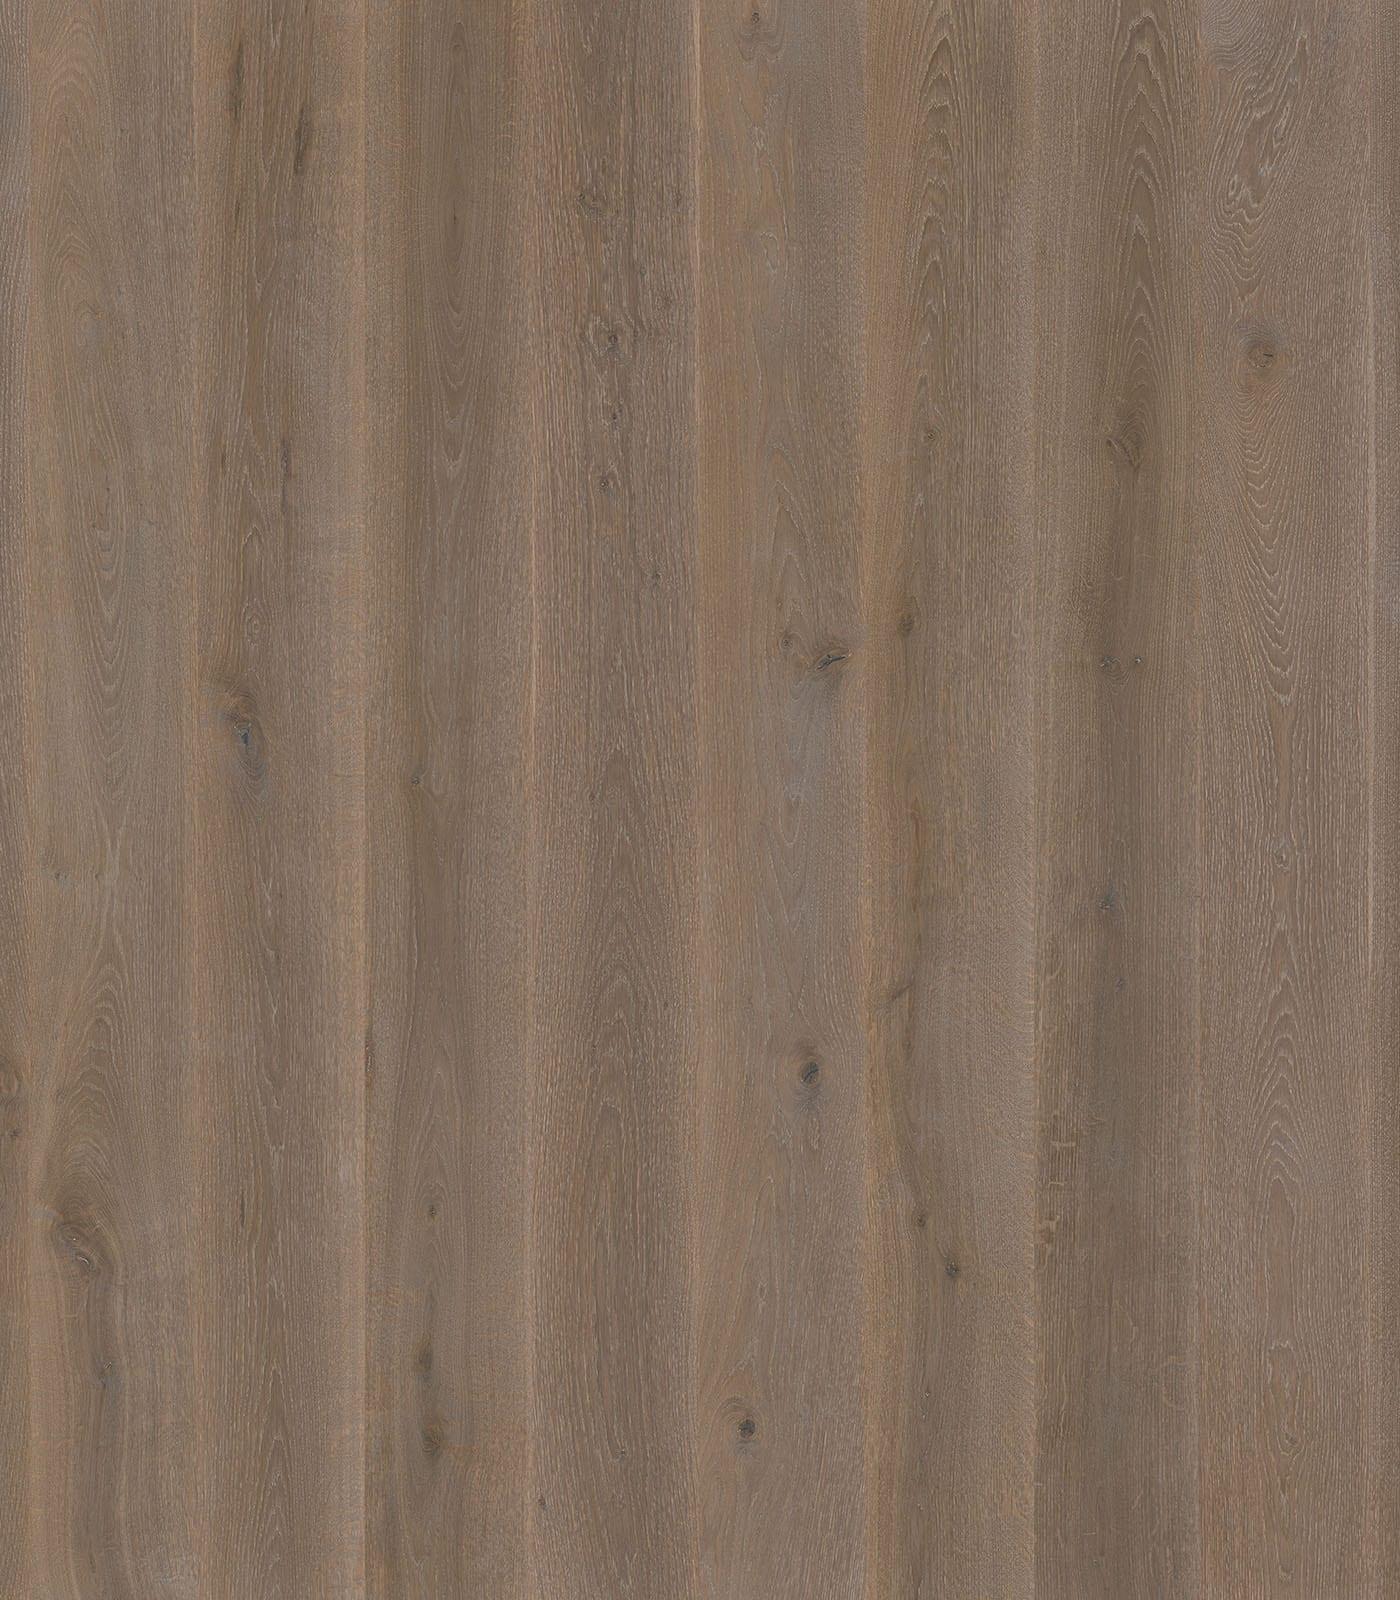 Venice-Lifestyle Collection-European Oak Floors-flat